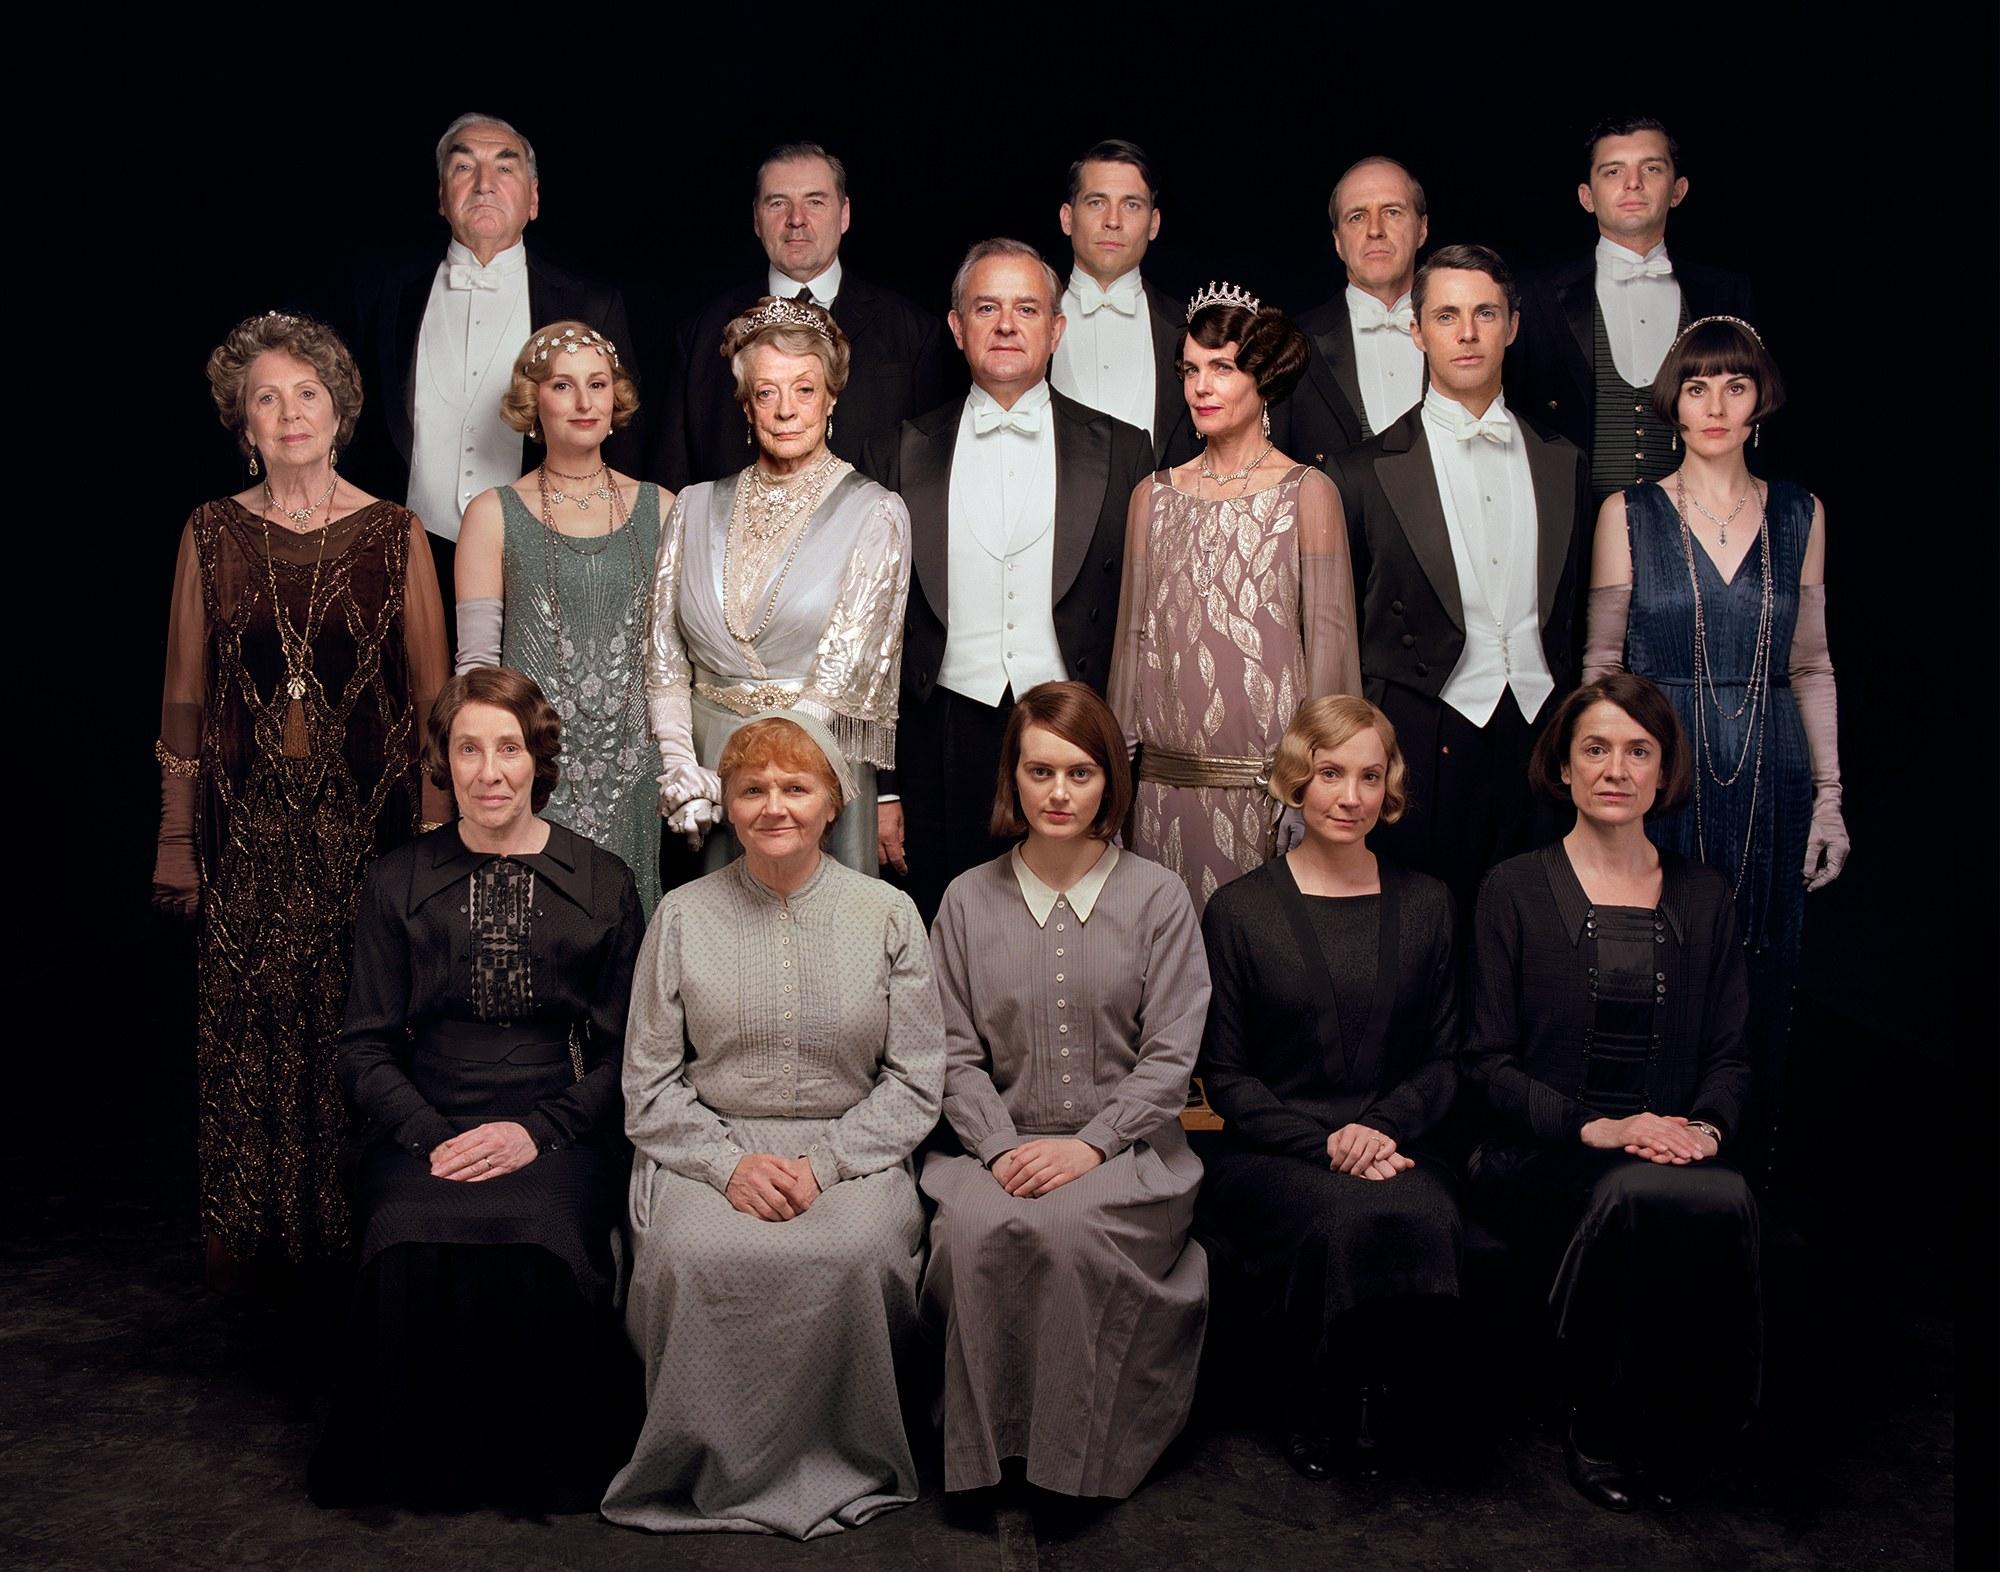 Exclusive The Downton Abbey Cast Reunites For A First Look Plus New Details On The Film Hugh Bonneville Online